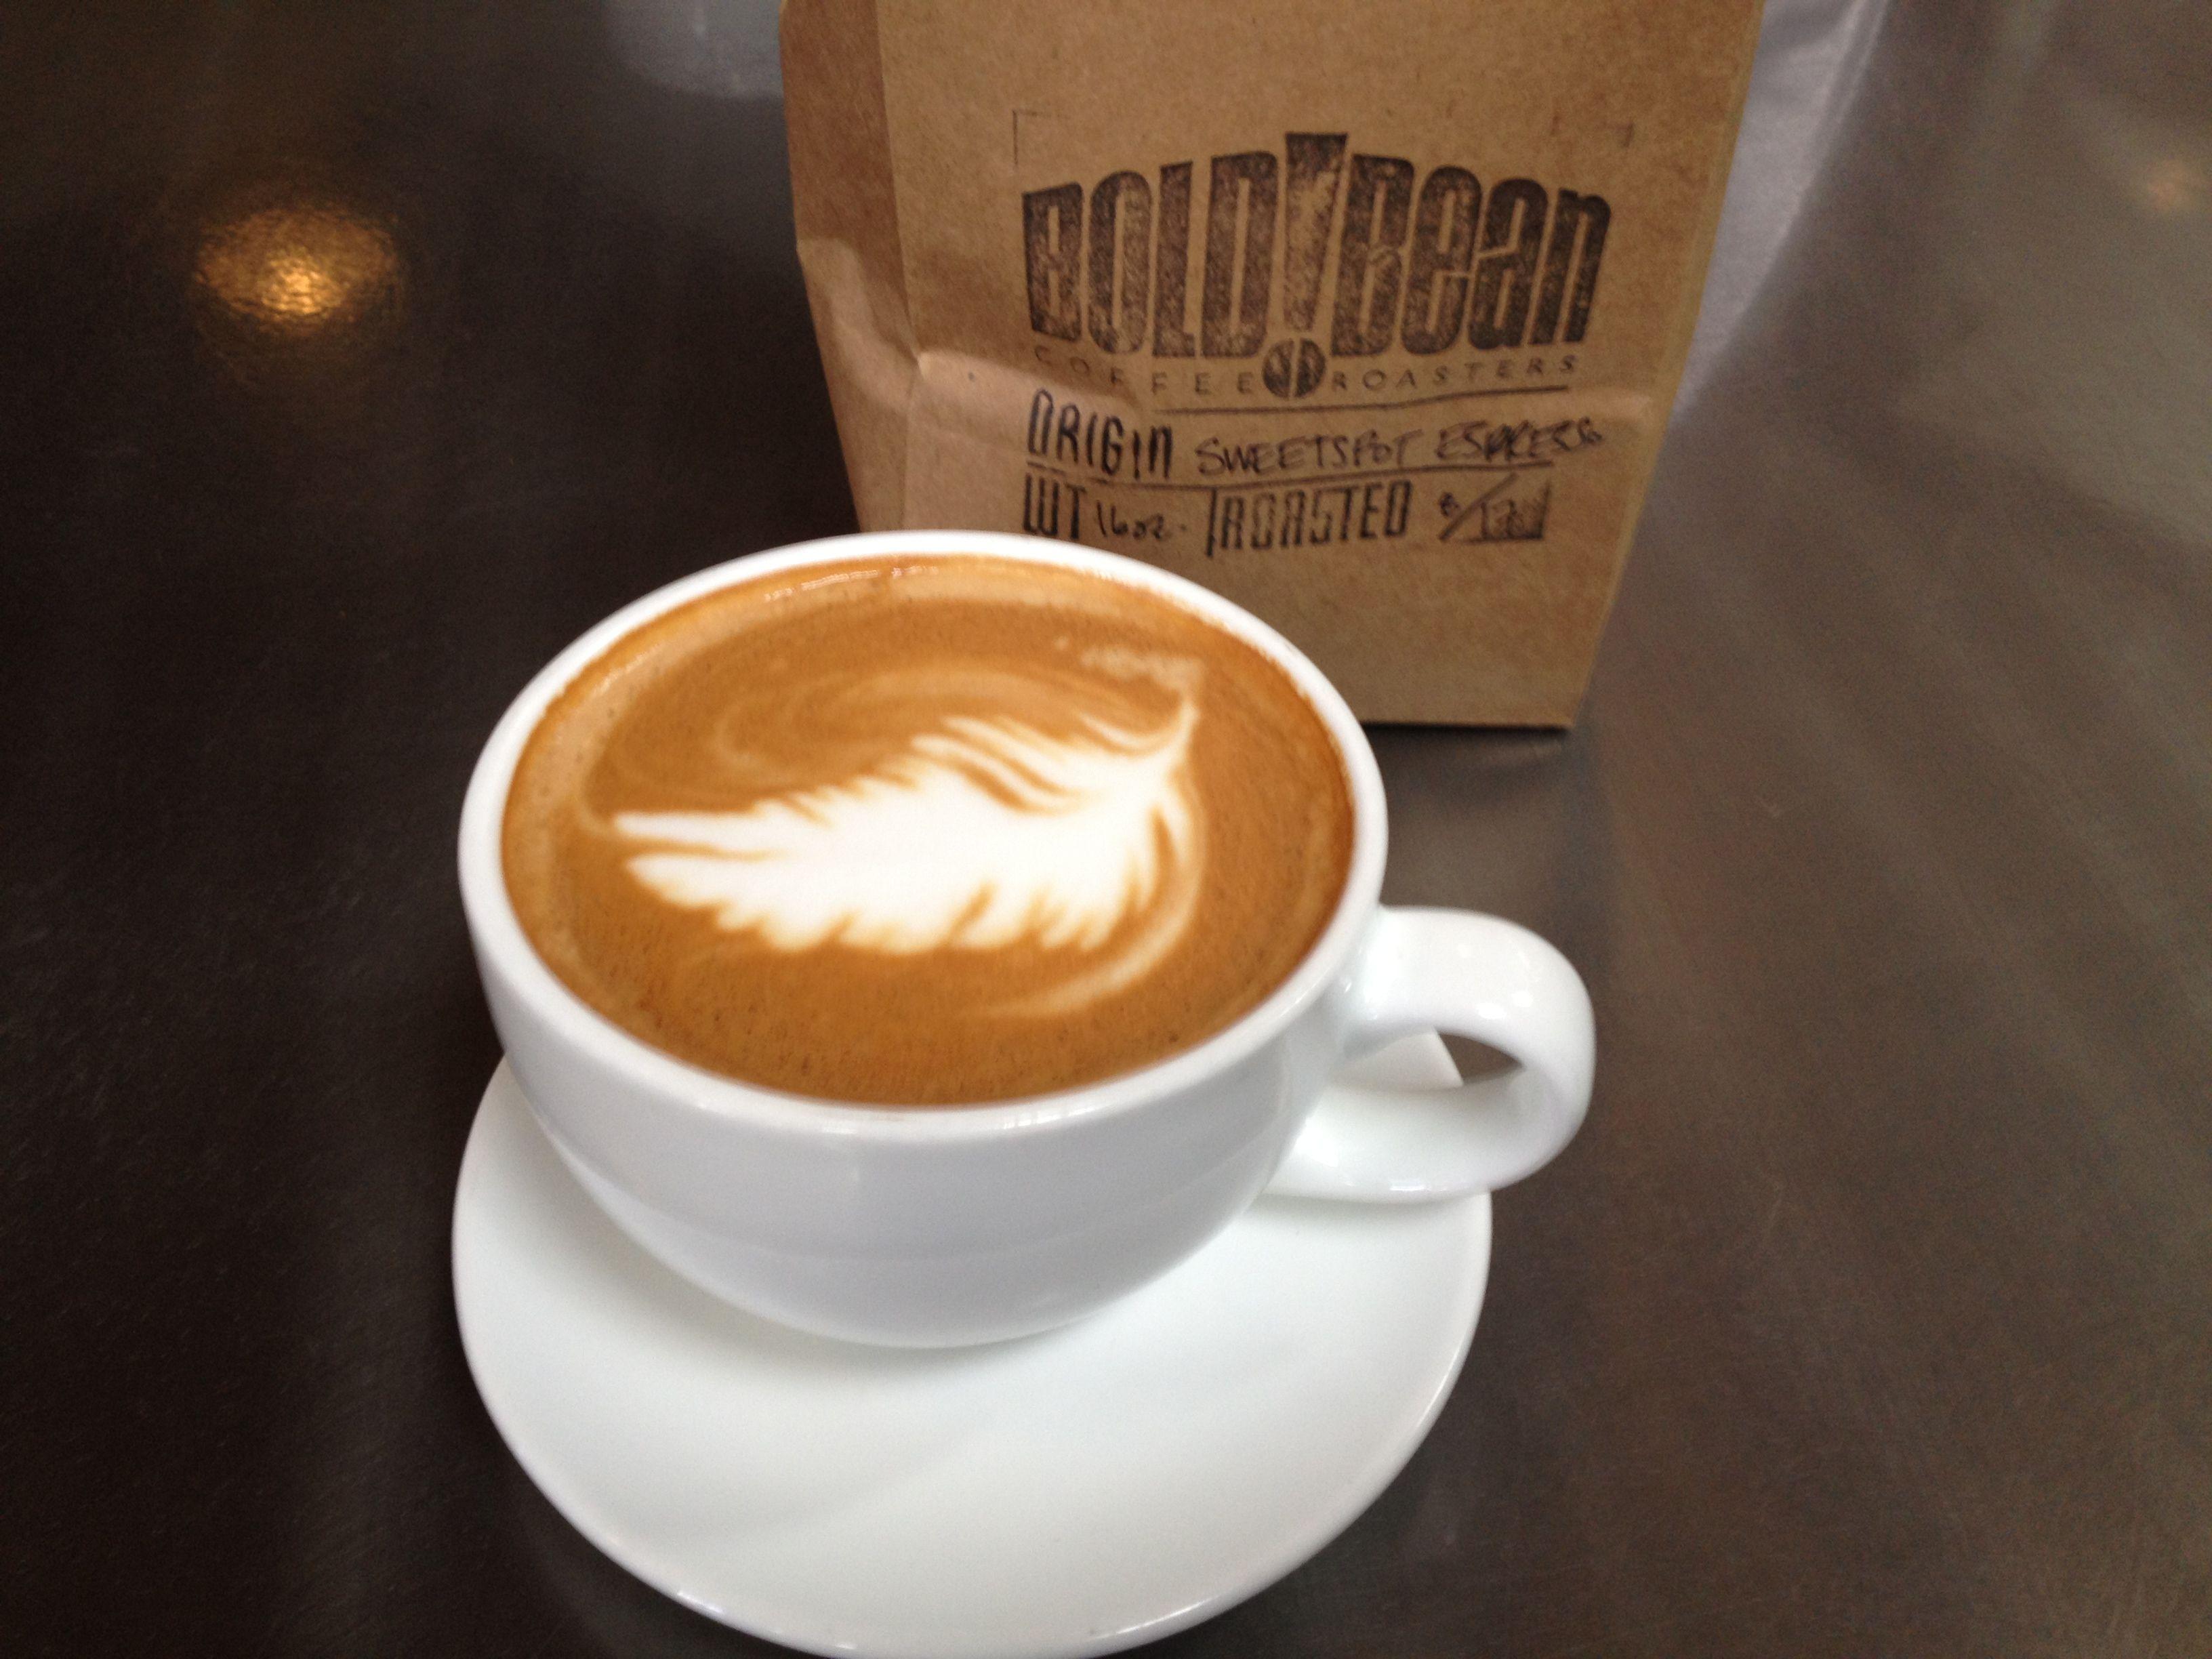 Bold Bean Sweet Spot Espresso